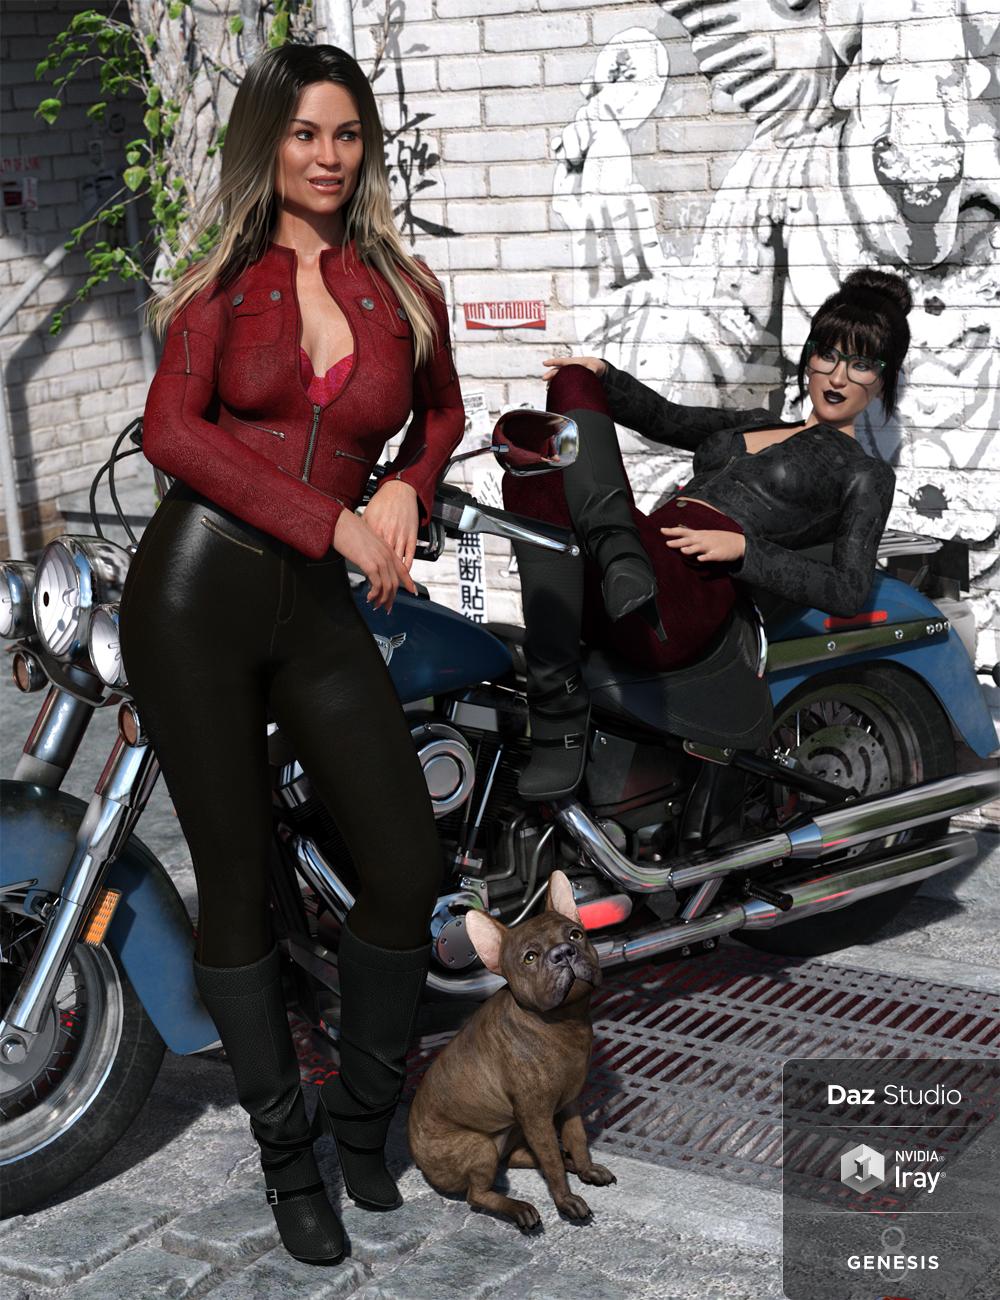 Moto Vixen Outfit Textures by: Anna Benjamin, 3D Models by Daz 3D